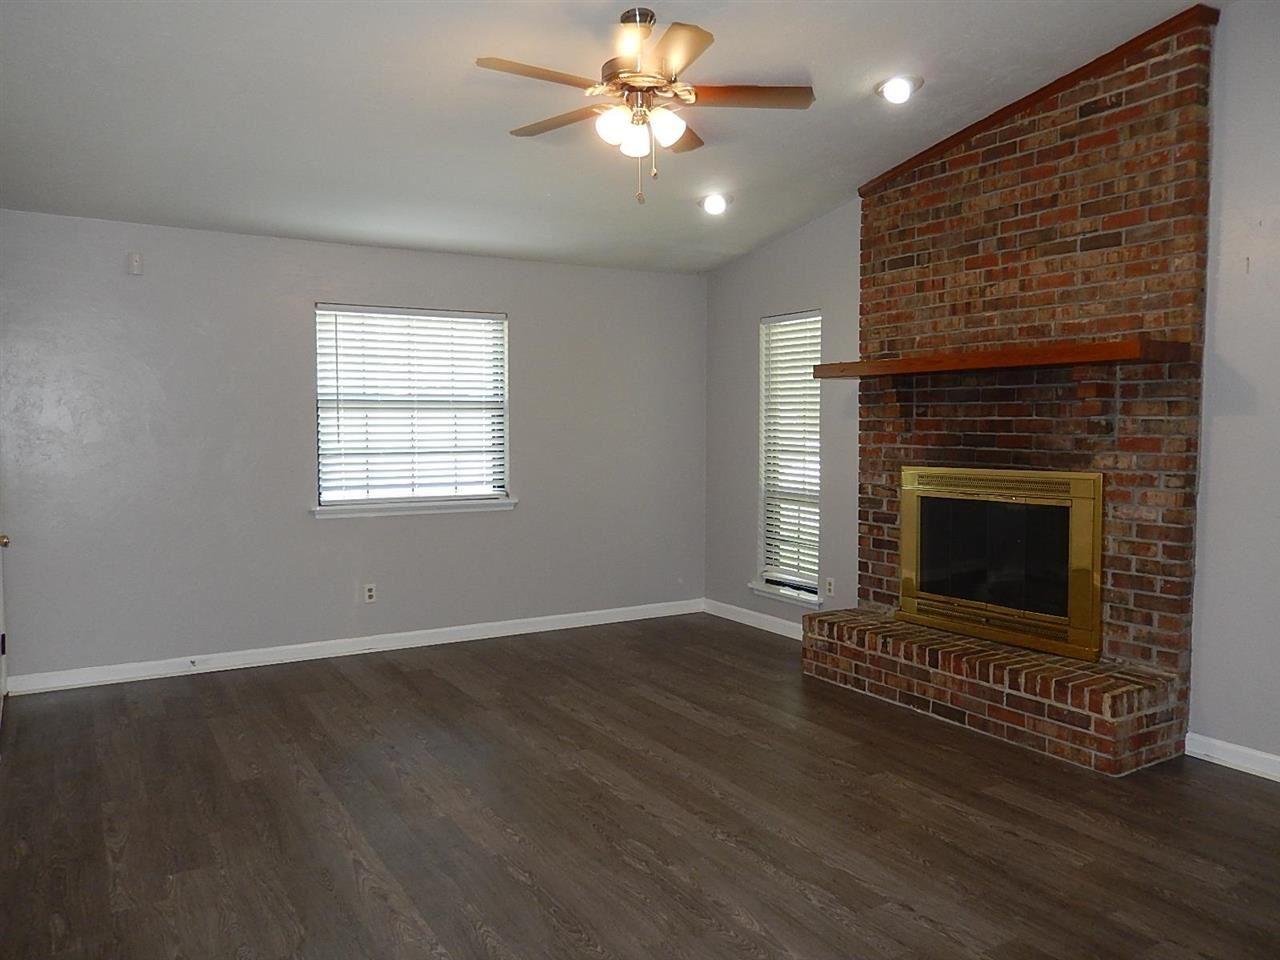 Photo of 2611 Panther Creek Road #4, TALLAHASSEE, FL 32308 (MLS # 335511)